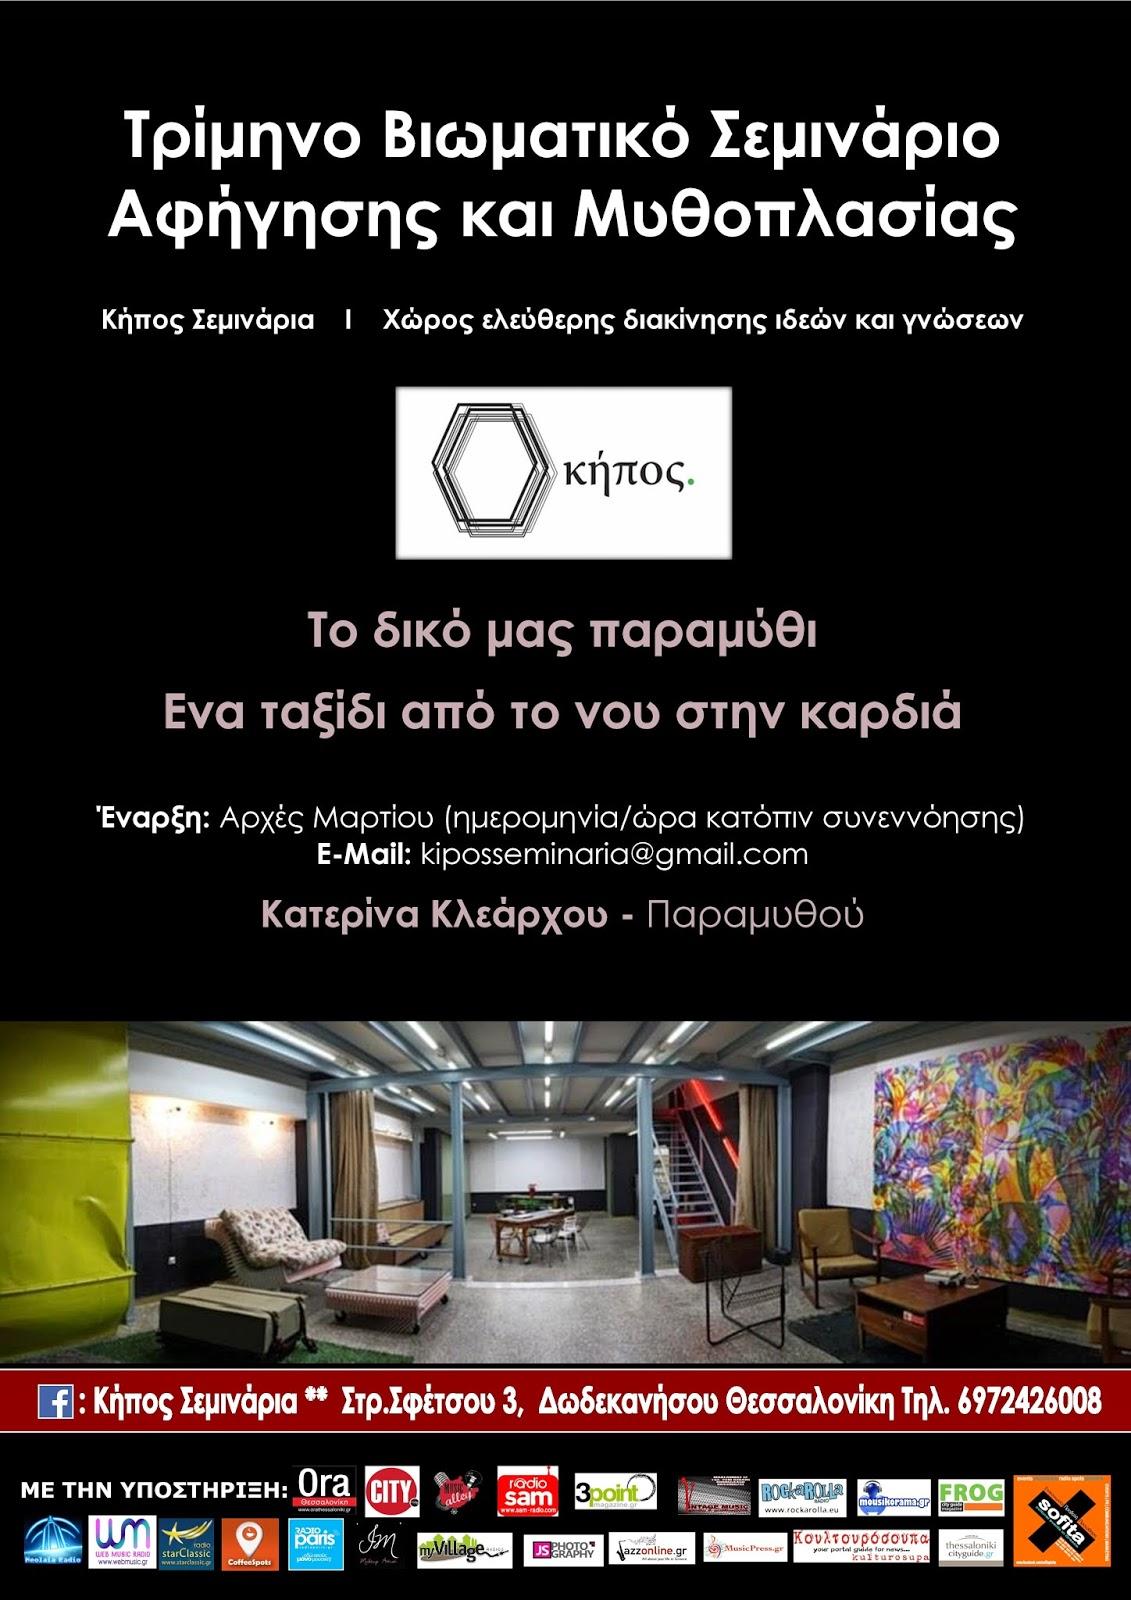 trimino-viomatiko-seminario-afigisis-kai-mythoplasias